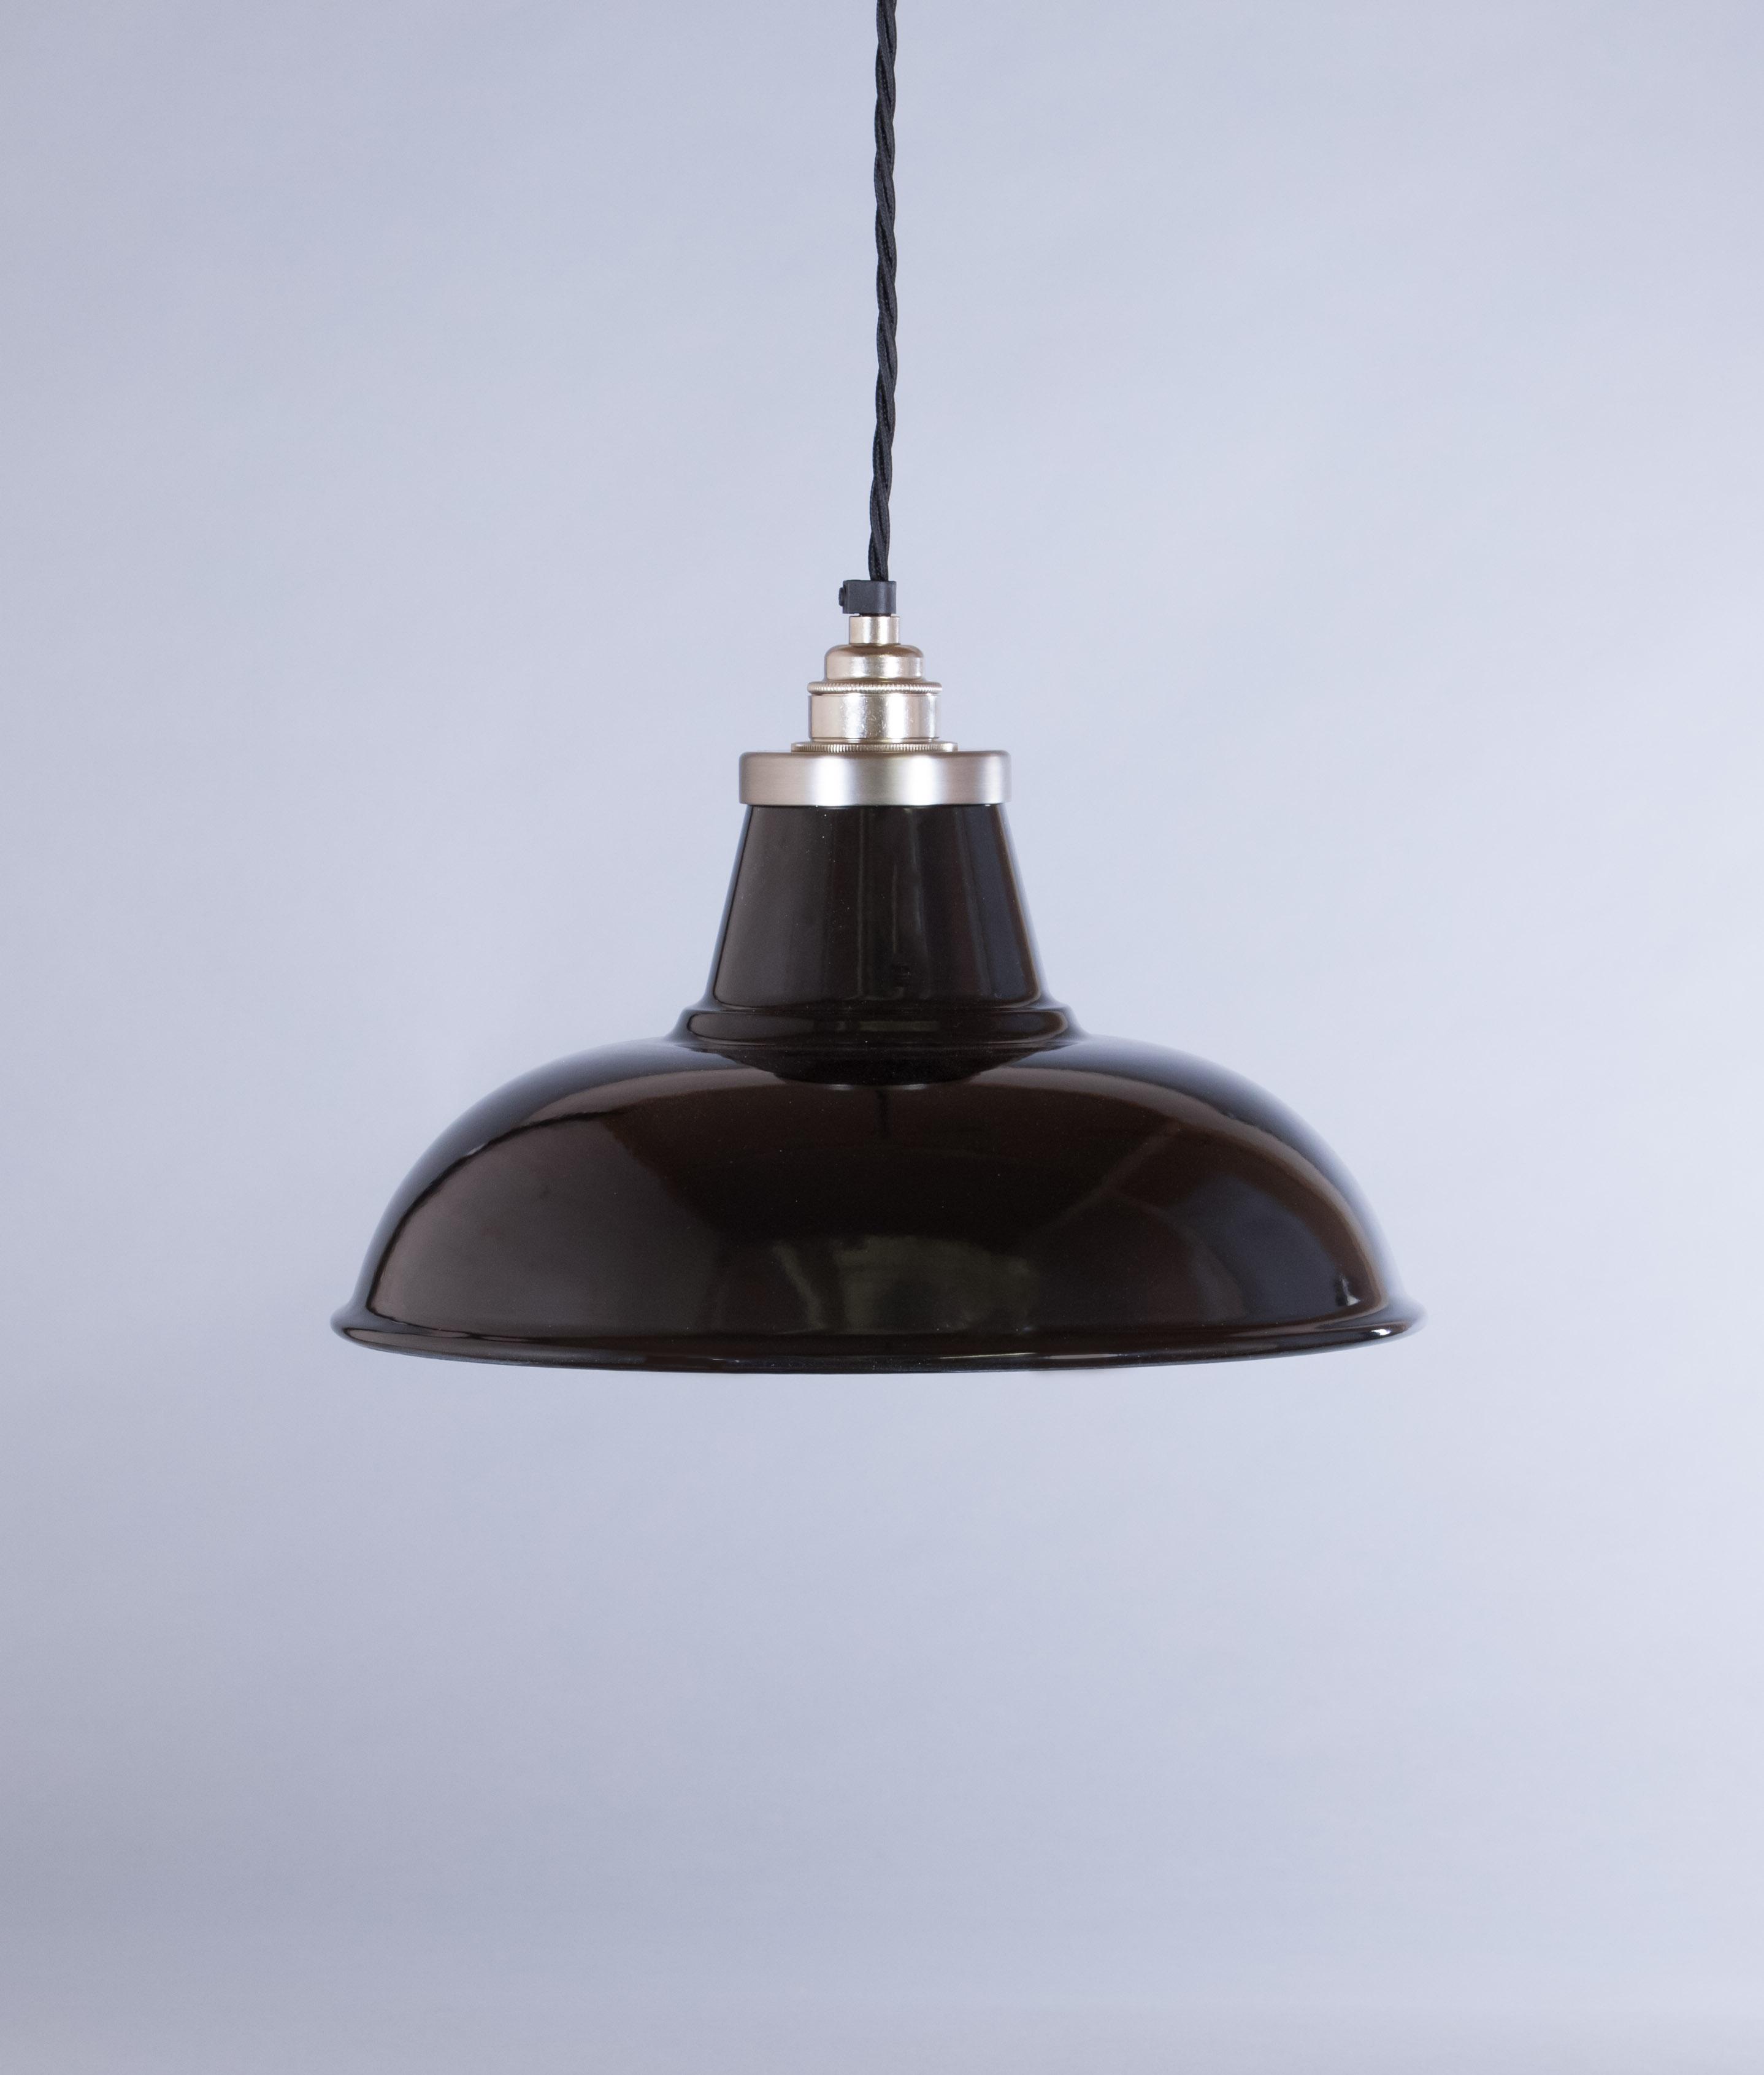 Black Enamel Pendant Light Shade Morley Industrial Style